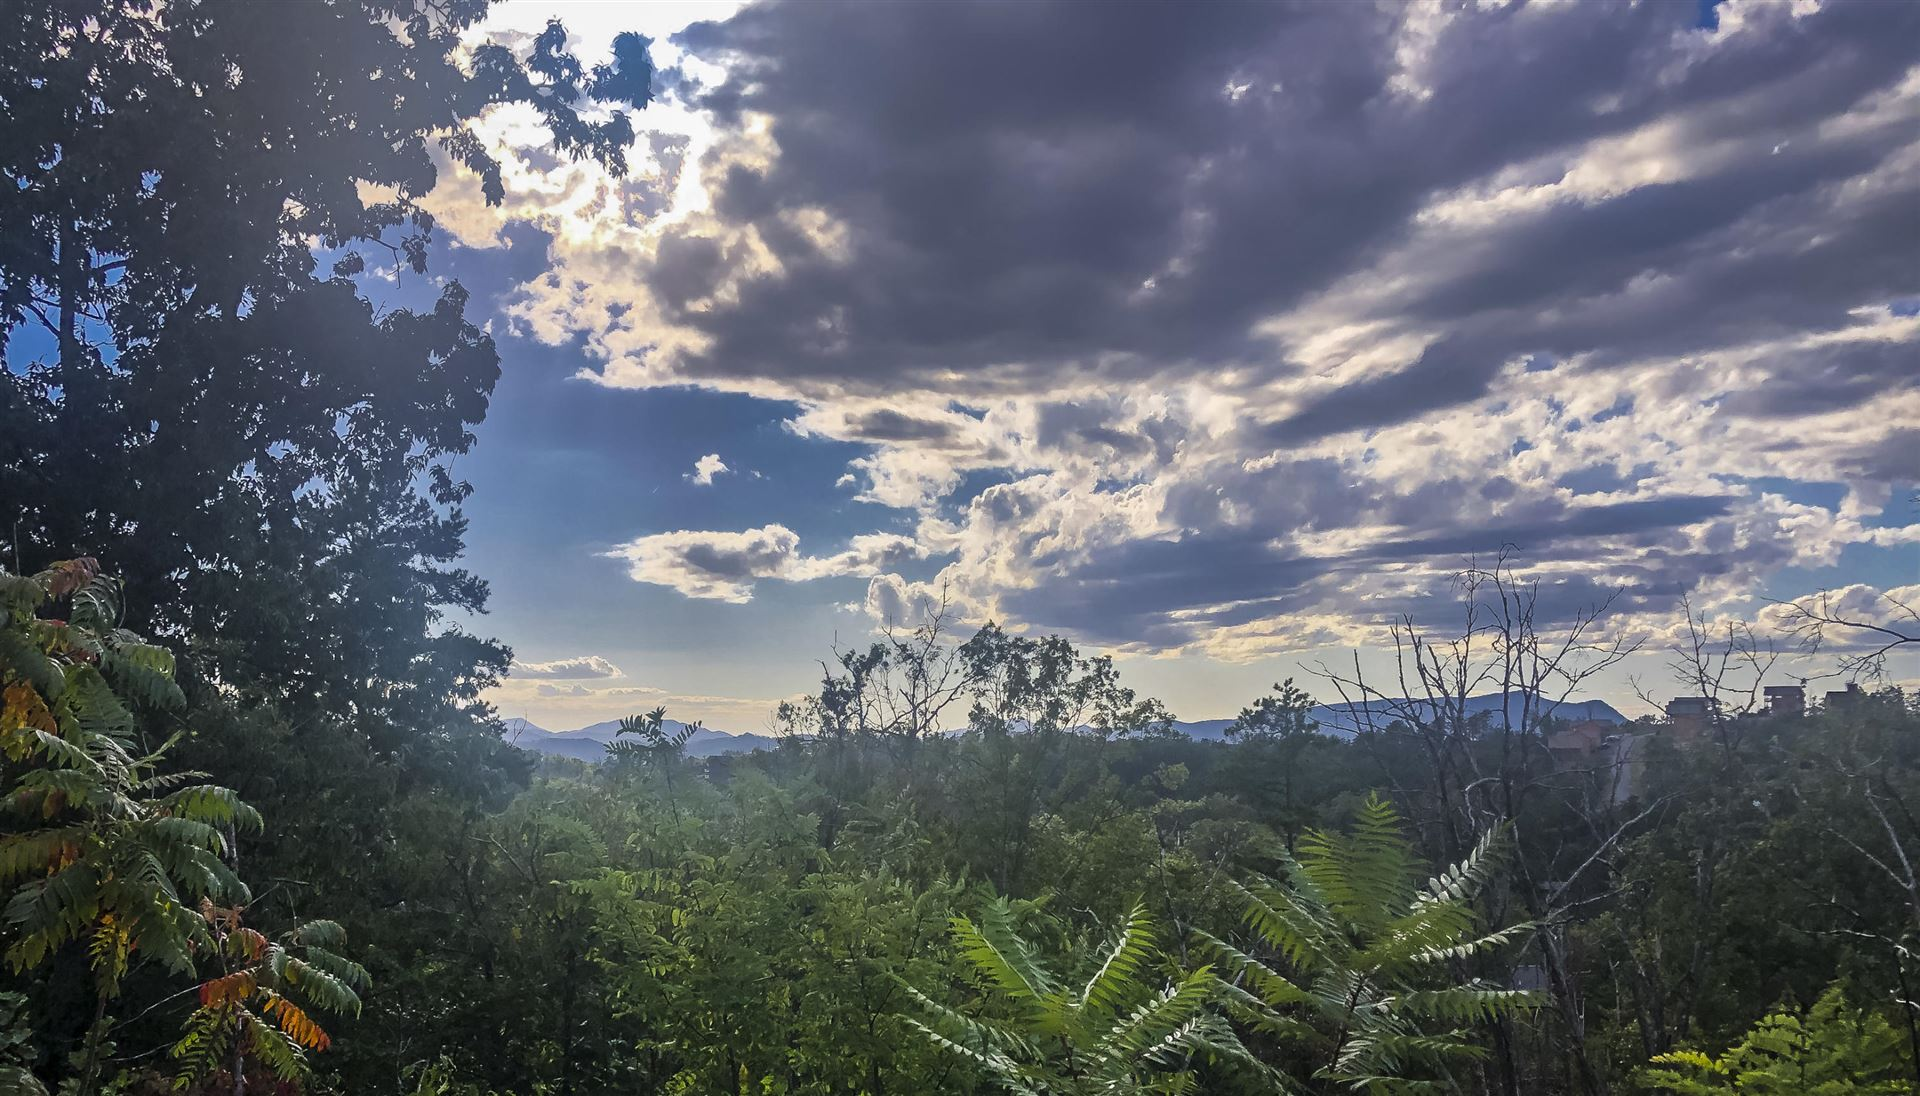 Photo of 2130 Windy Lane, Sevierville, TN 37876 (MLS # 1131533)